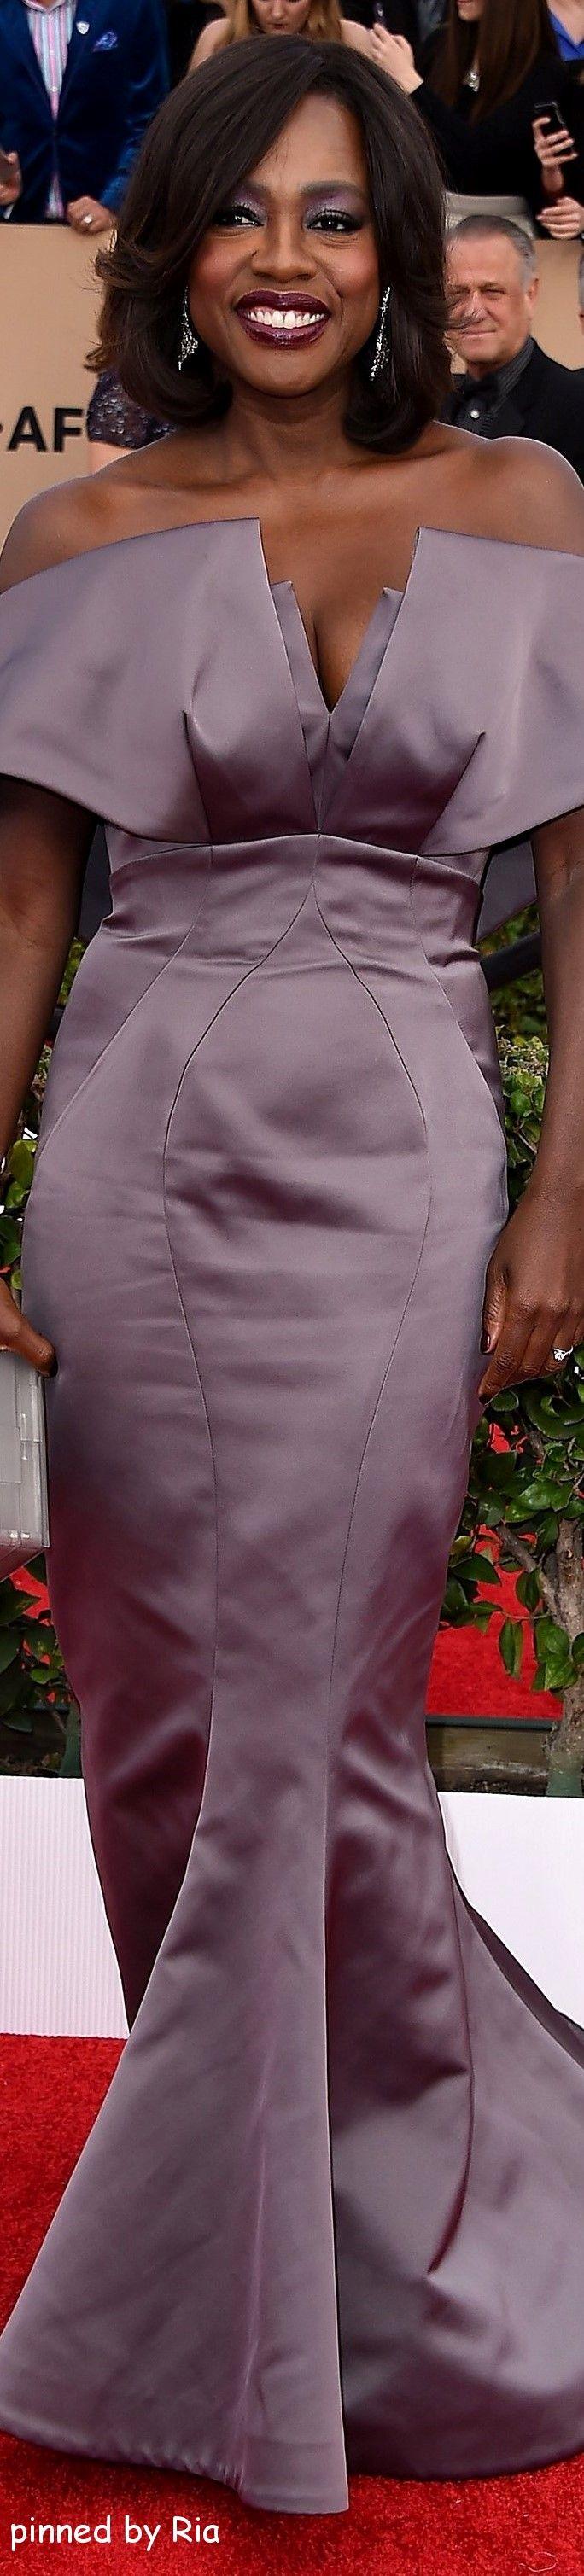 Viola Davis l Sag Awards 2016 l Ria